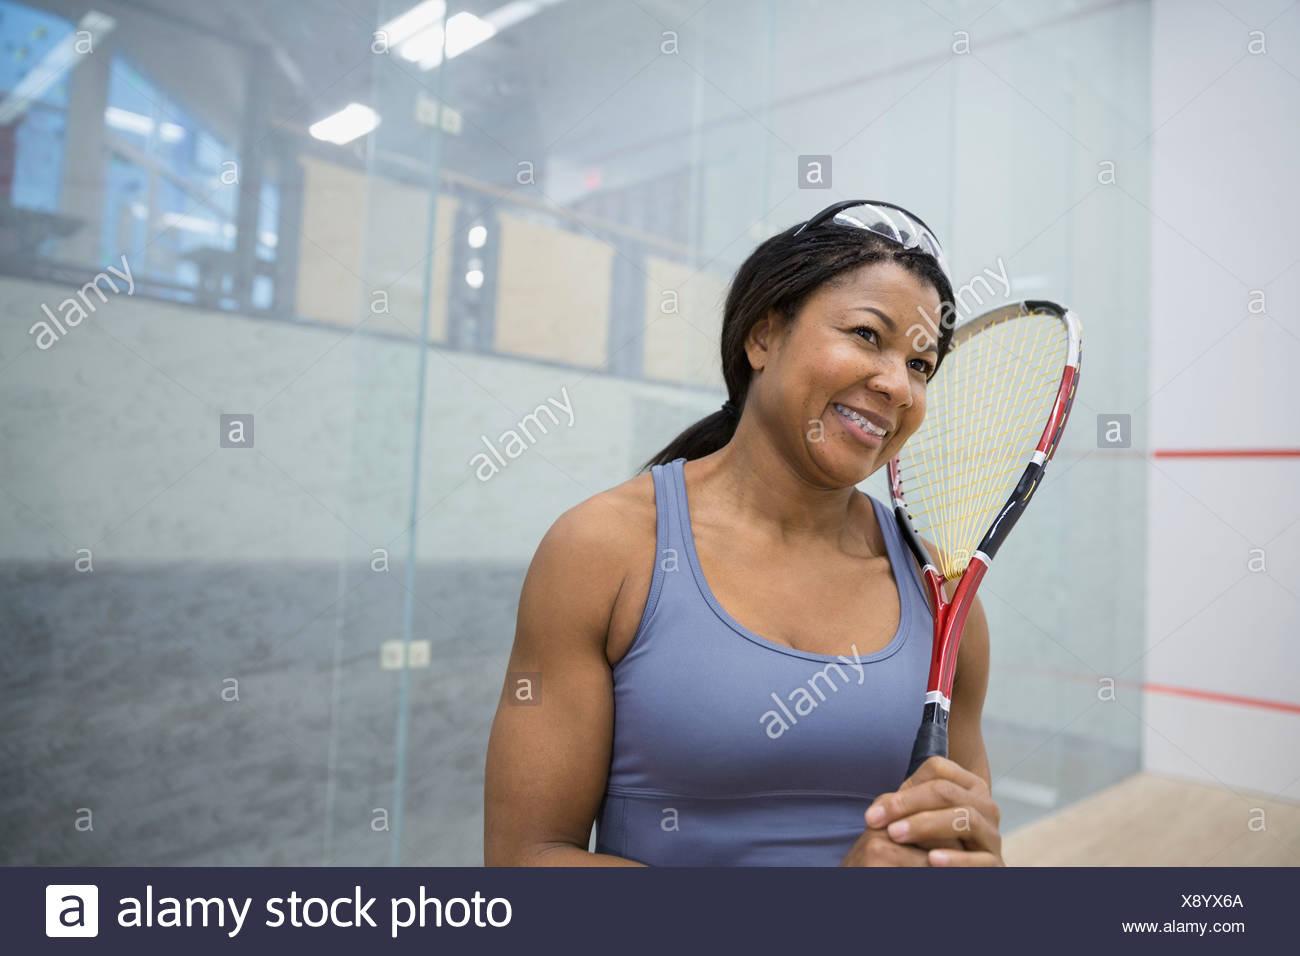 Donna sorridente holding per racchette da squash Immagini Stock